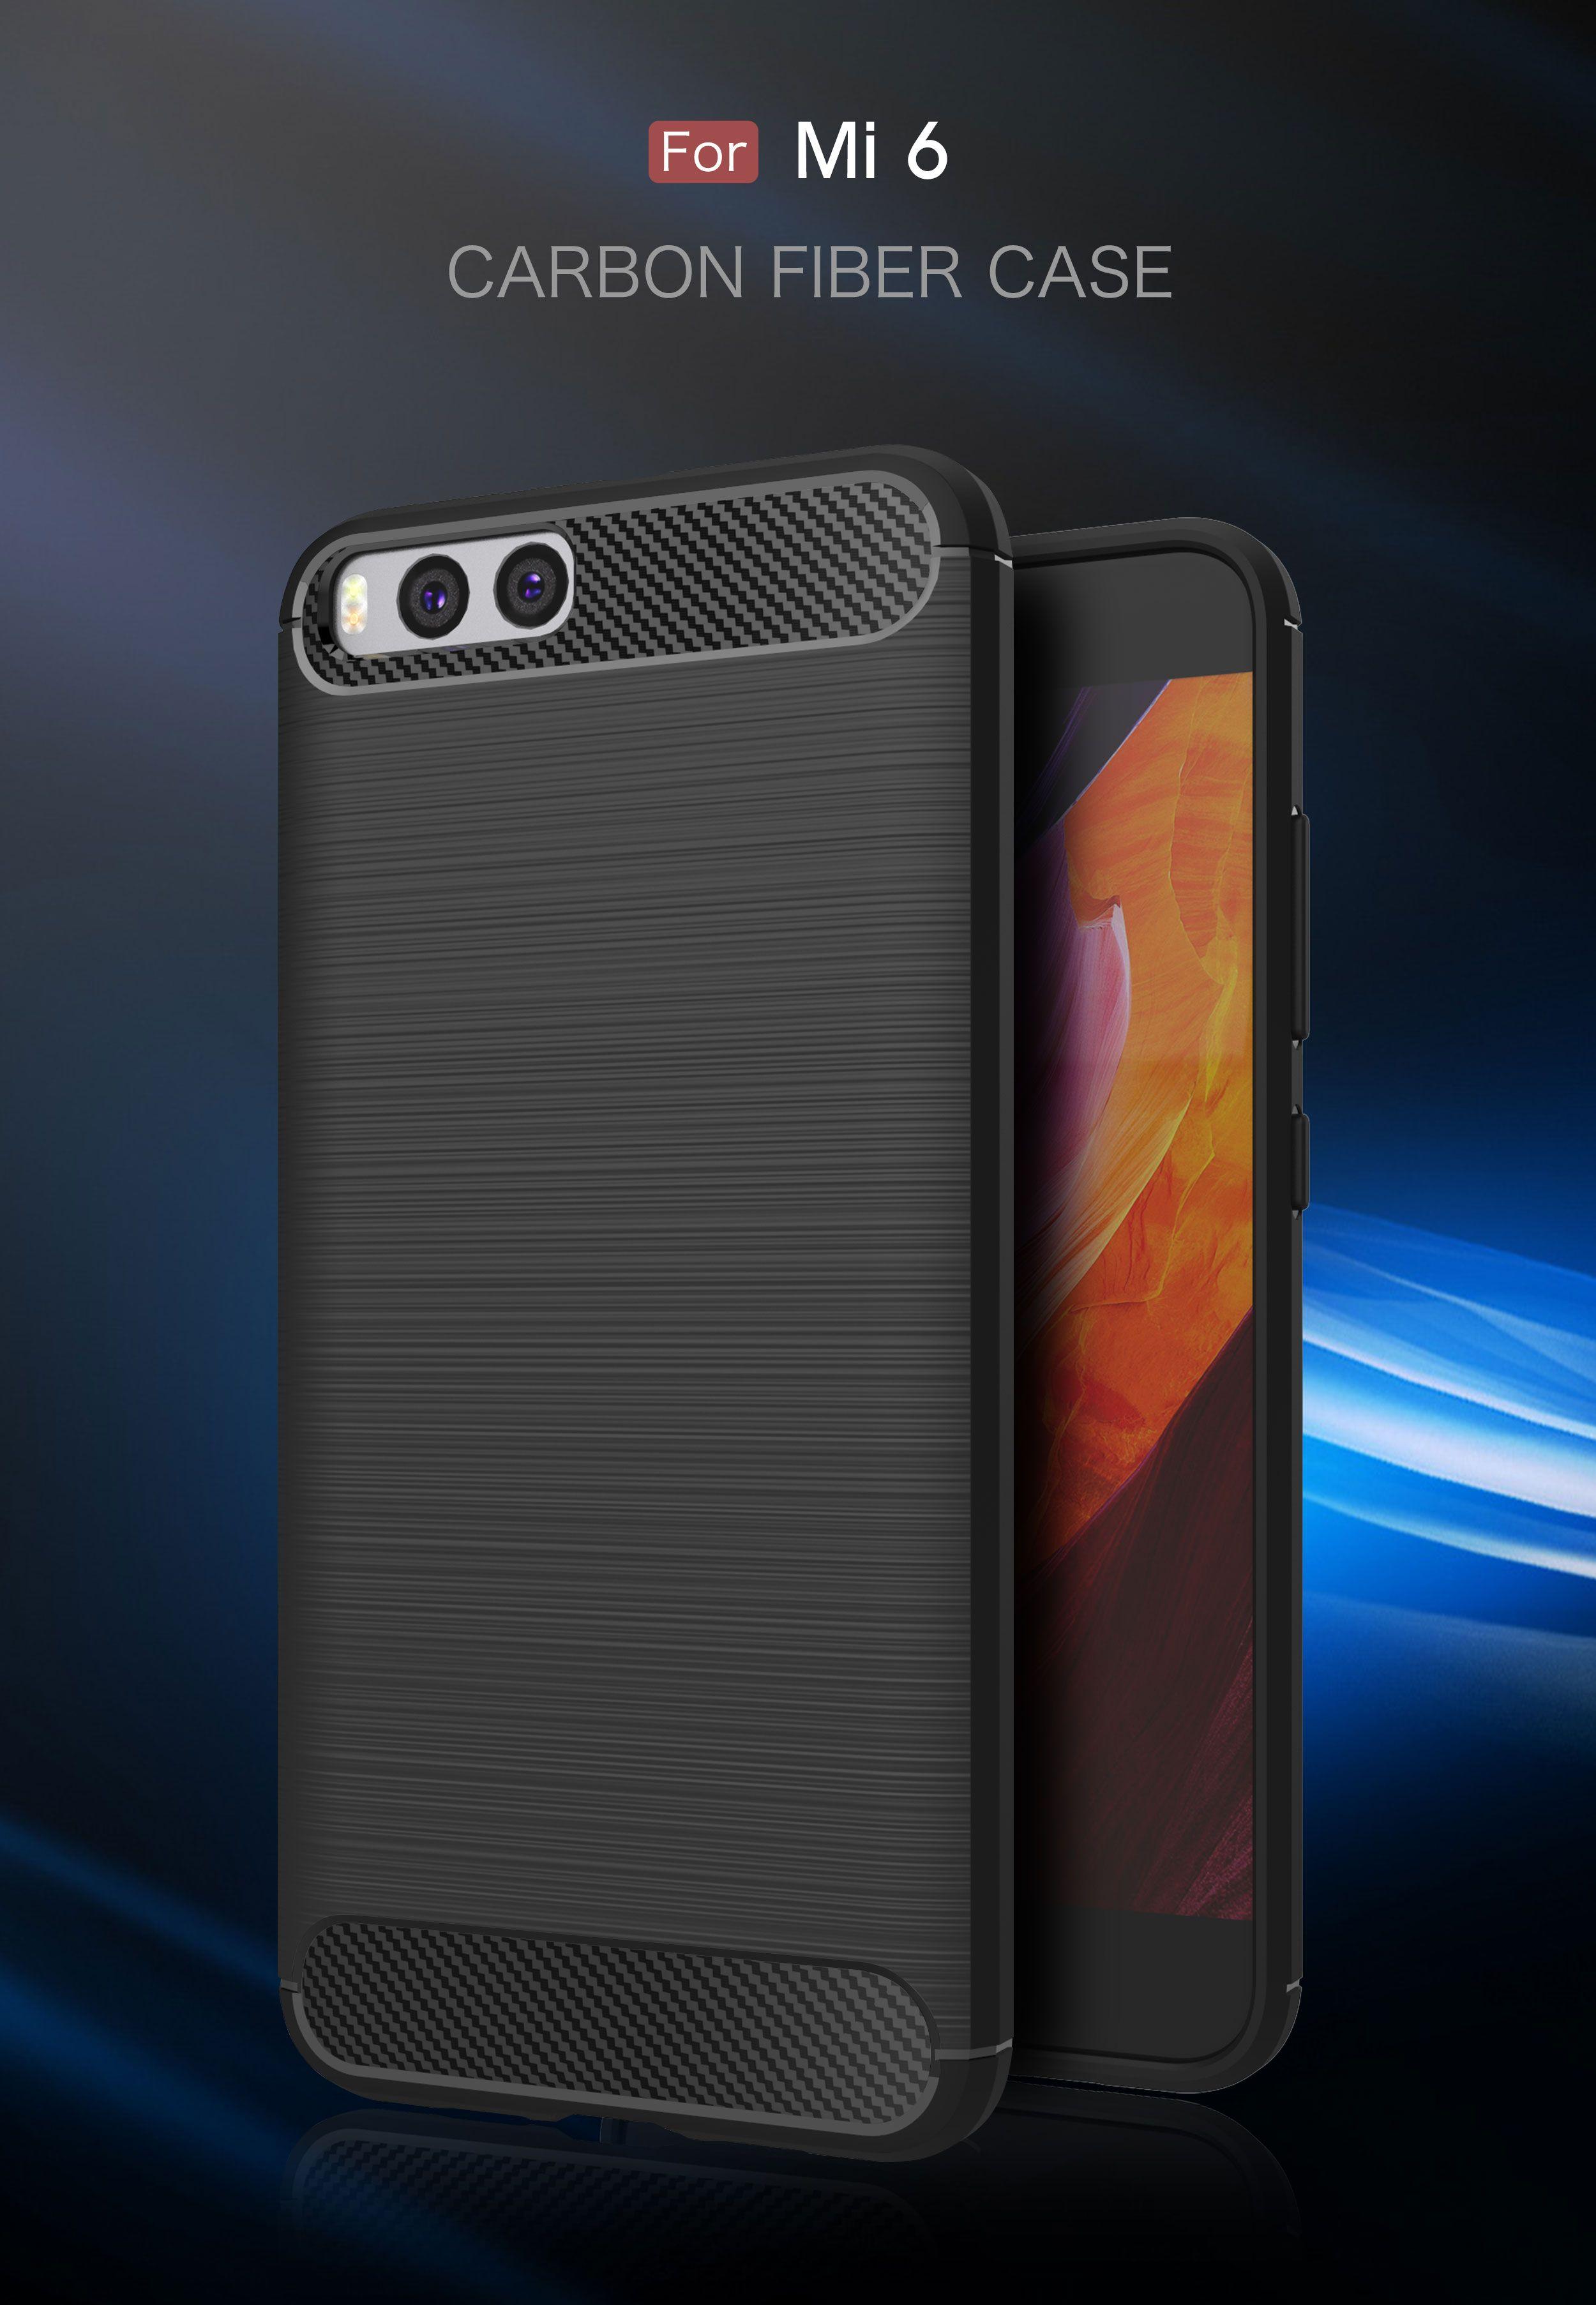 info for 53da3 78b4f Carbon Fiber Case For Xiaomi Note 3 Mix 2 Redmi Note 5A Prime Max 2 Mi 6  Plus 5X A1 Brushed Silicone Soft Rubber Back Cover Armor Rugged